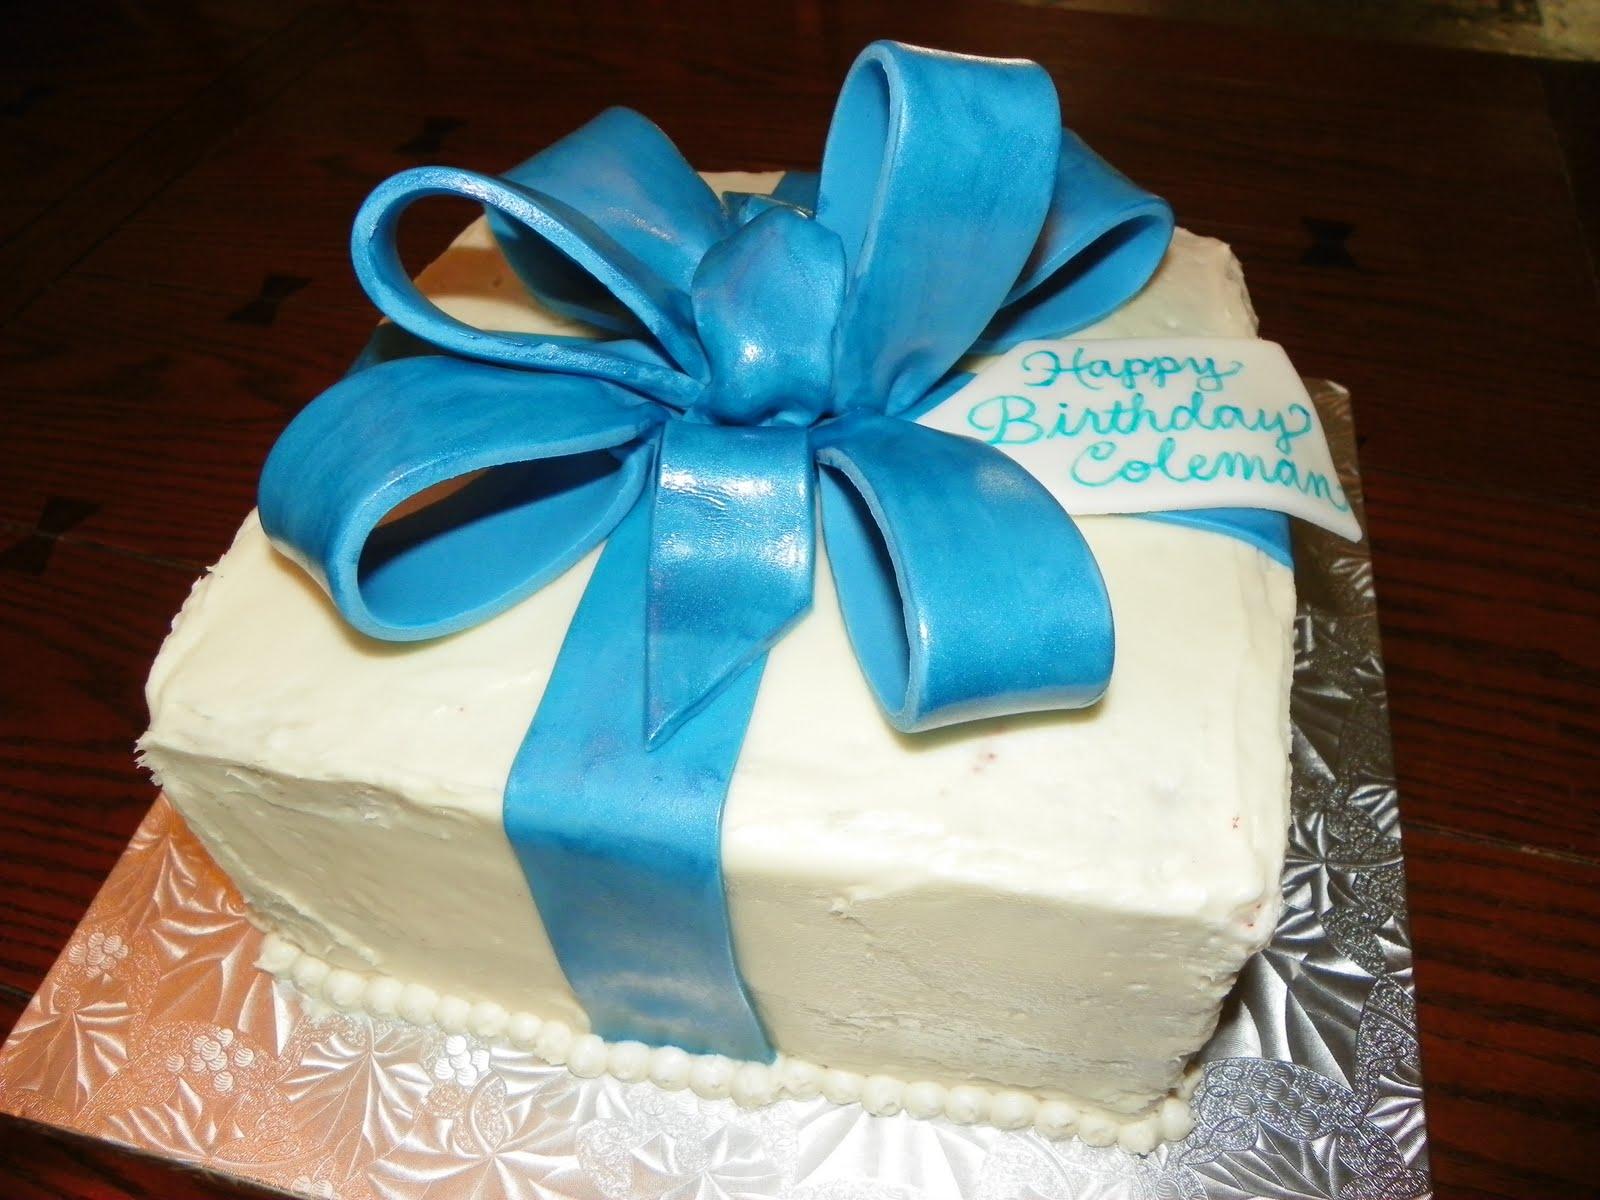 Plumeria Cake Studio Birthday Present Cake